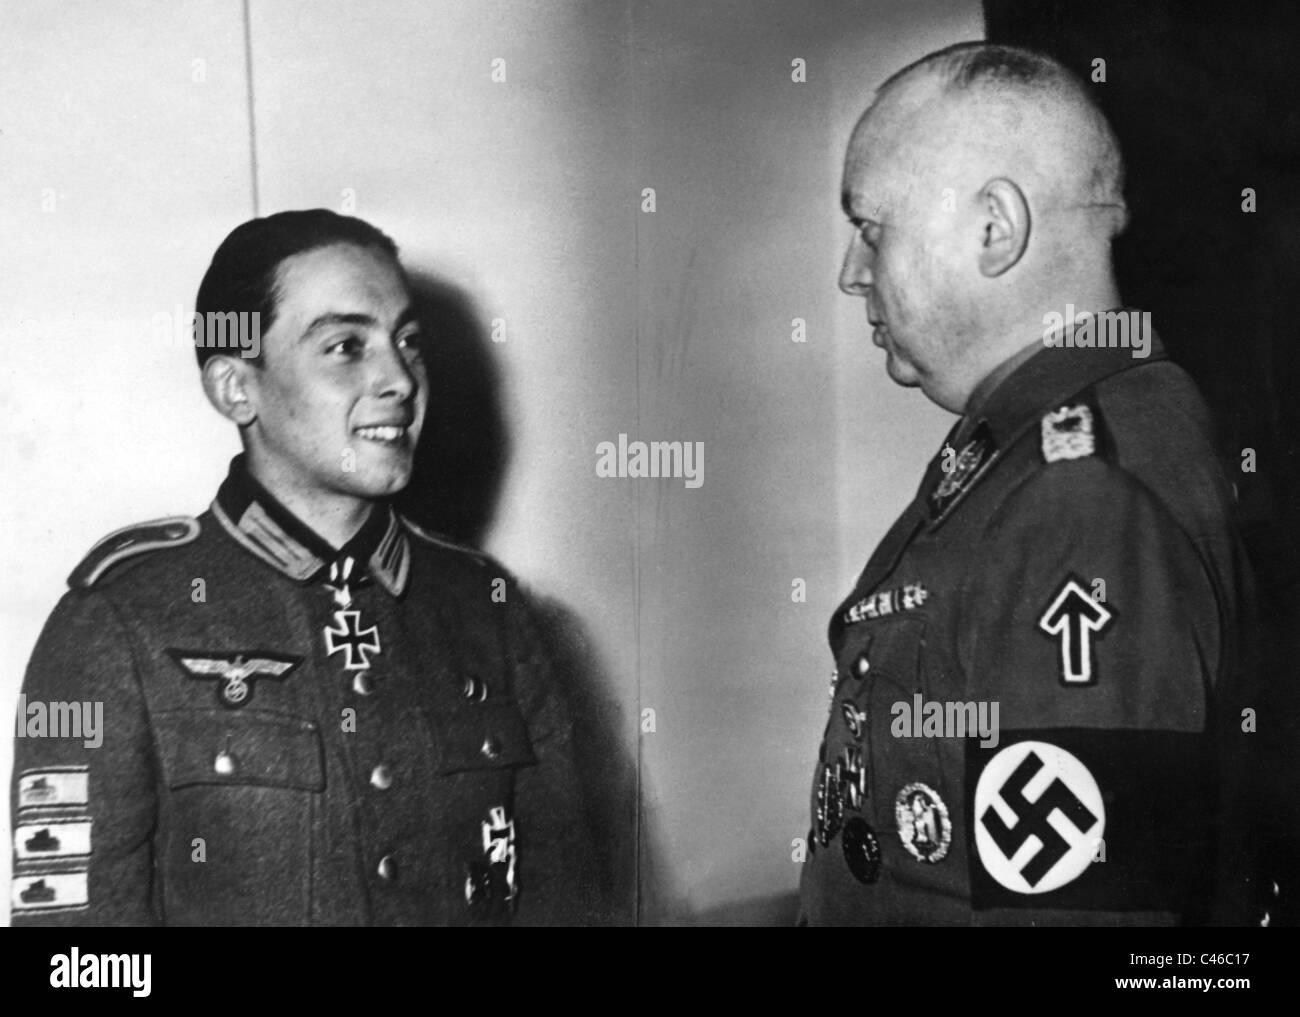 Second World War: Division 'Feldherrnhalle' (SA) - Stock Image